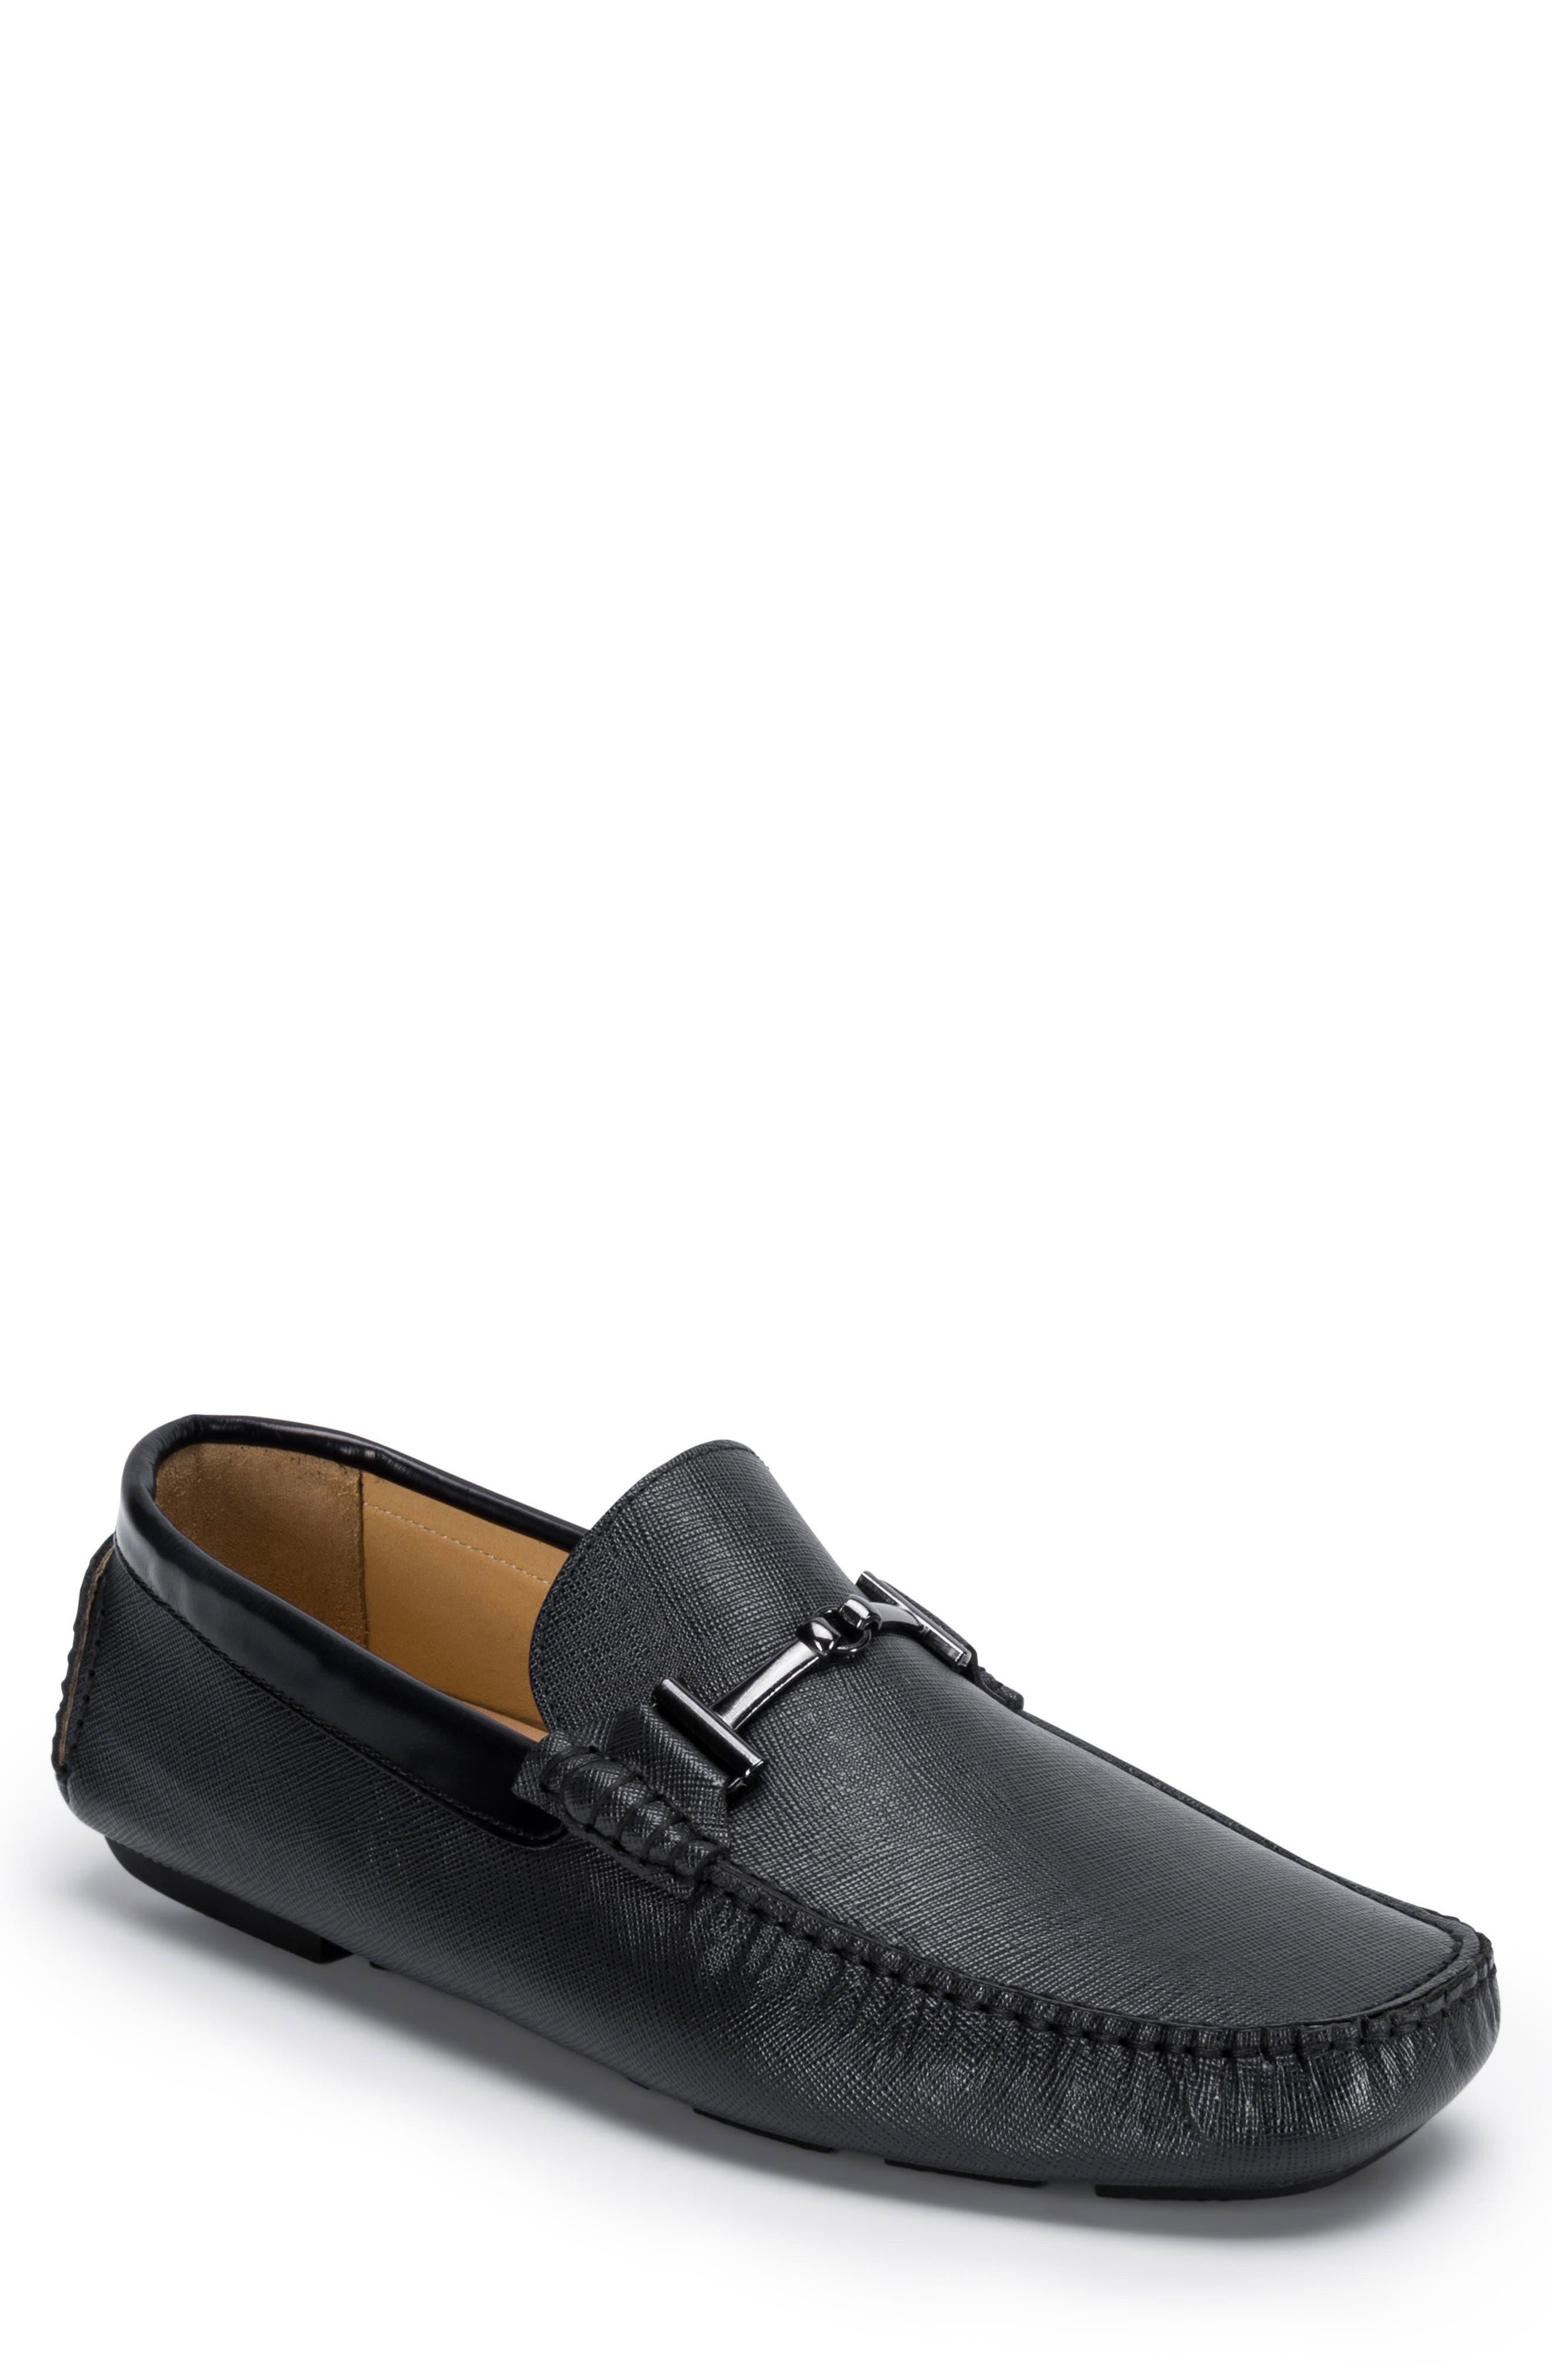 Capri Driving Shoe,                         Main,                         color, 001